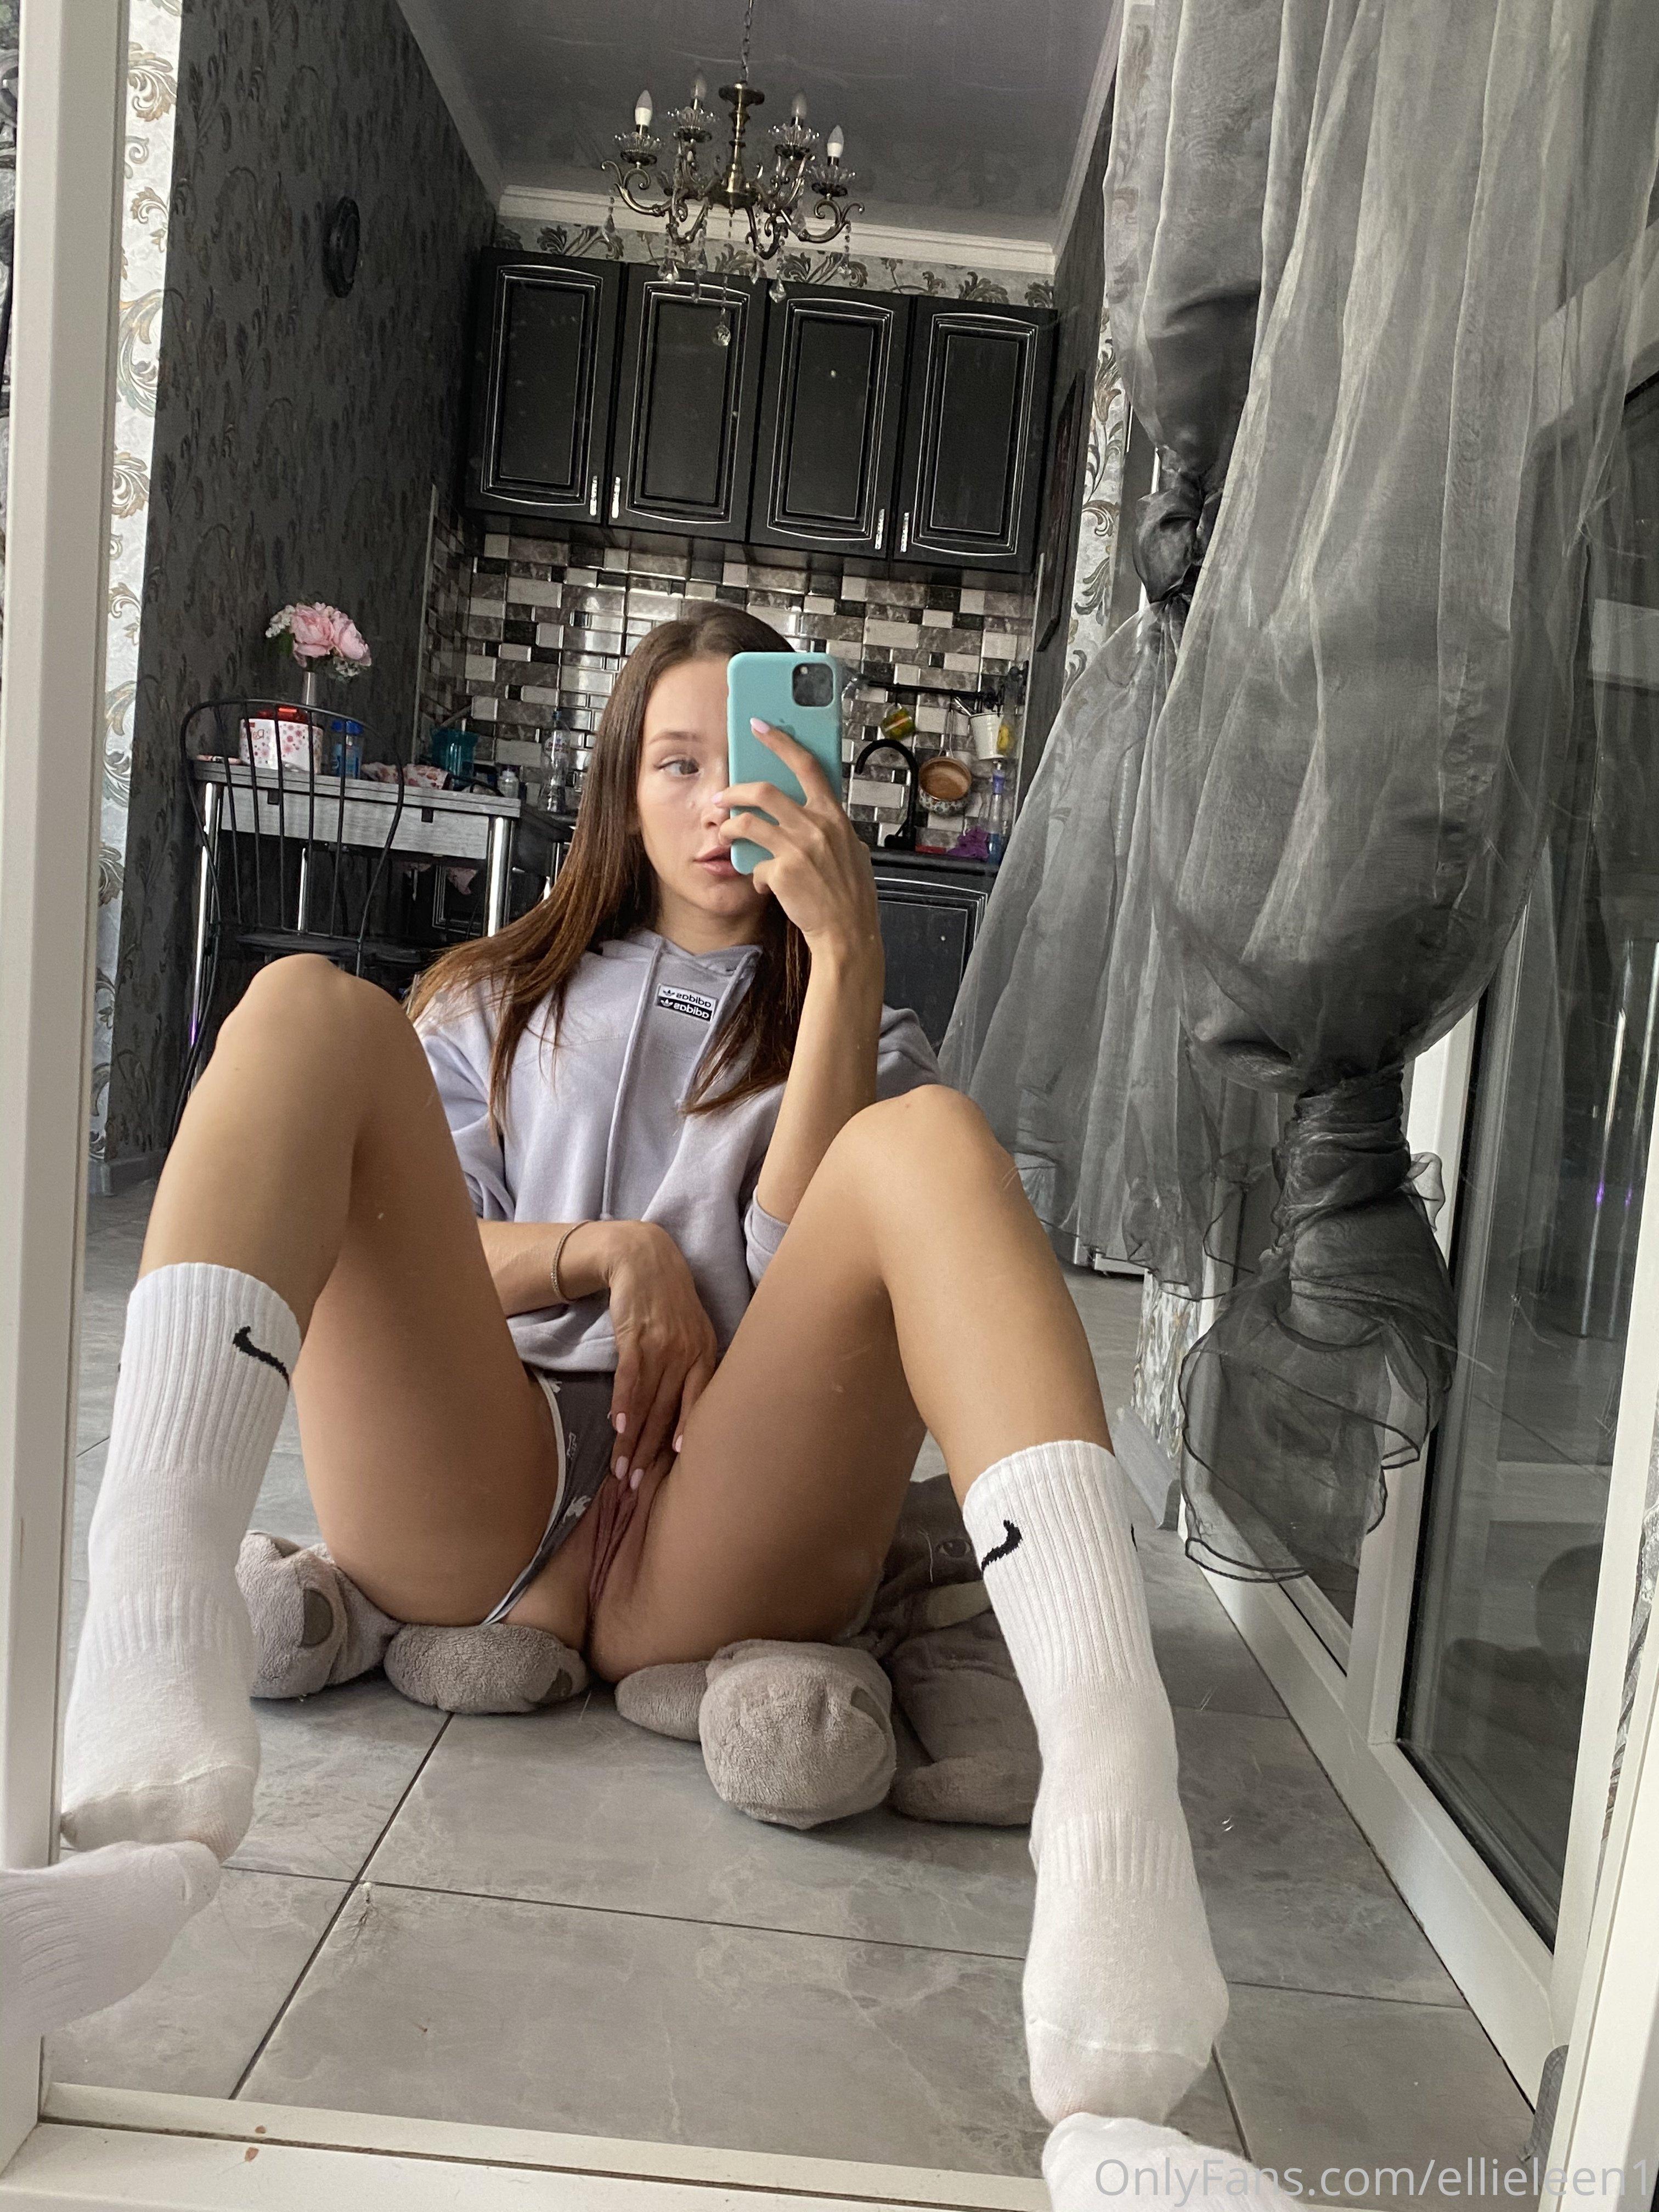 Ellie Leen Ellieleen1 Onlyfans Leaked 0114